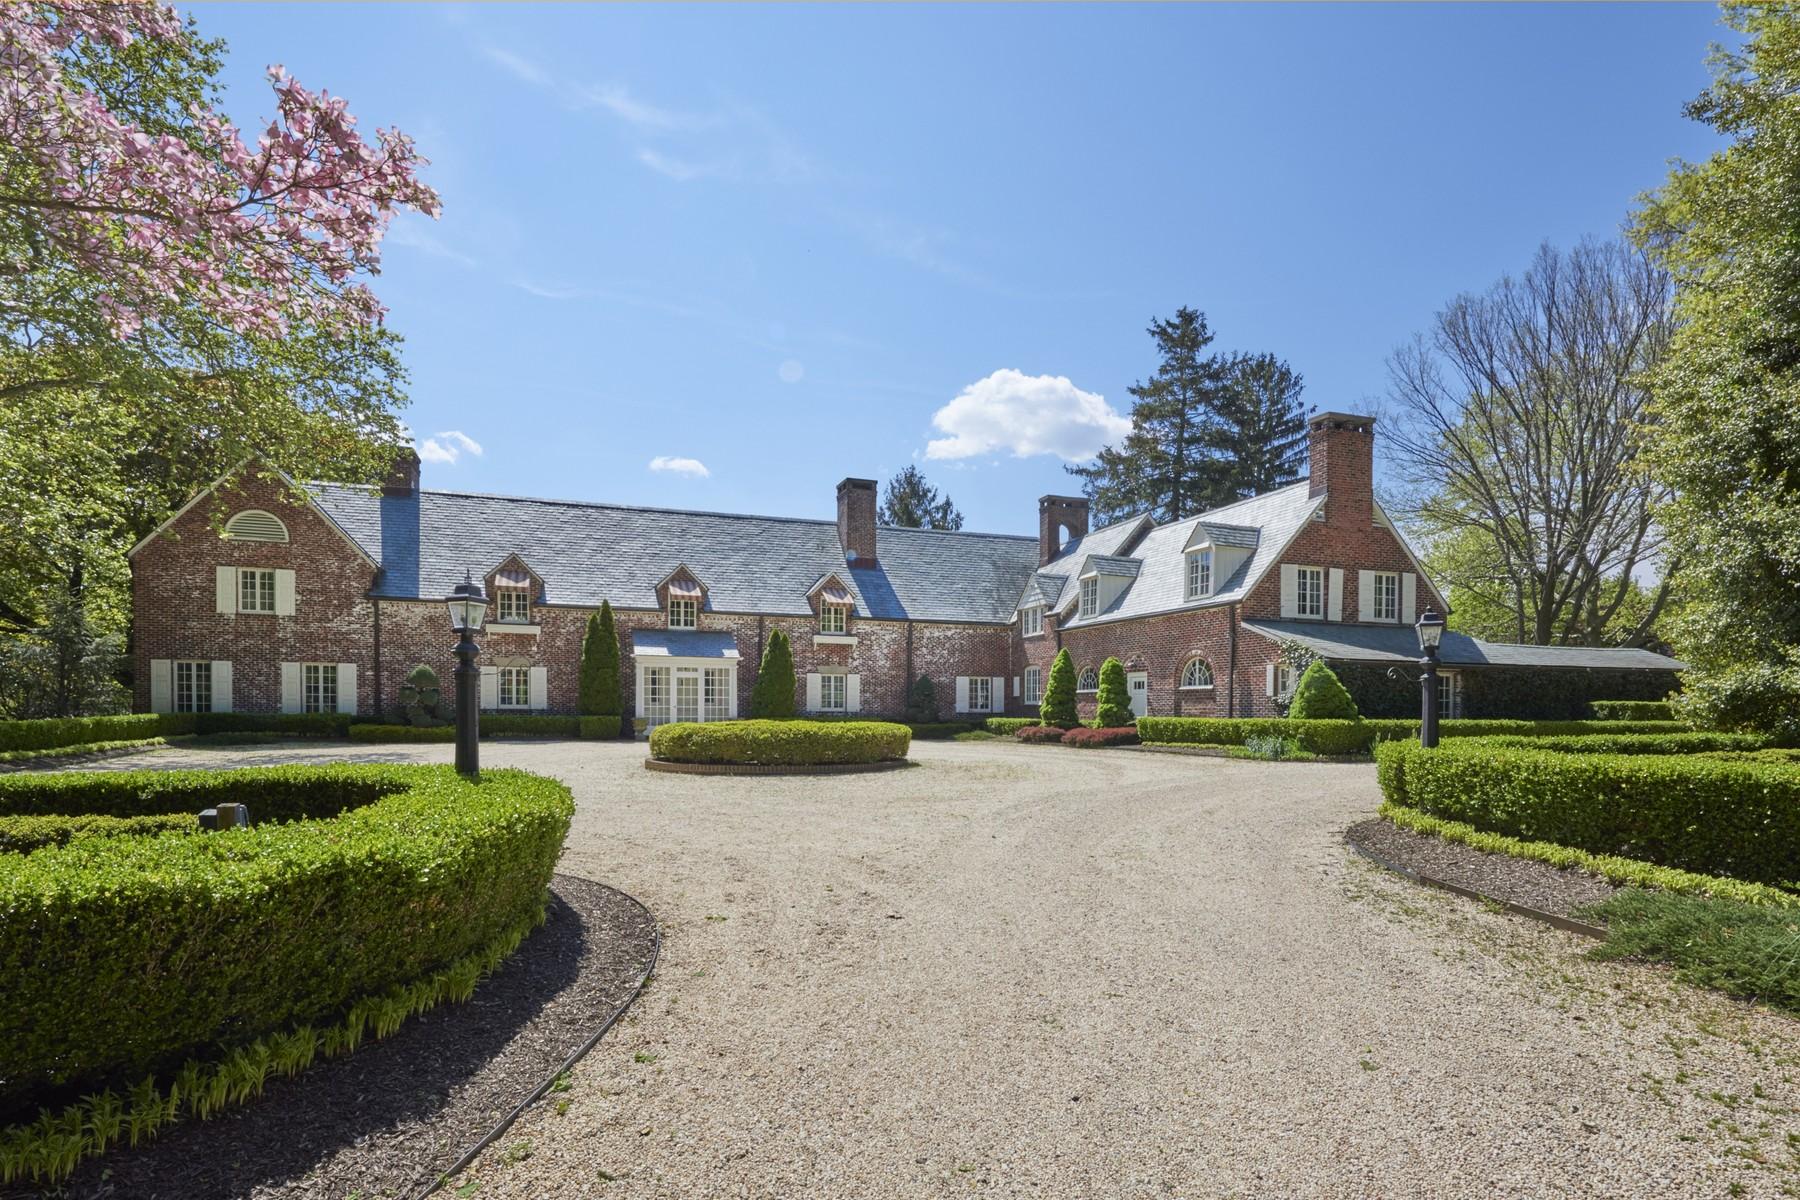 Villa per Vendita alle ore Hidden Gem 7 Somerset Dr Rumson, New Jersey, 07760 Stati Uniti